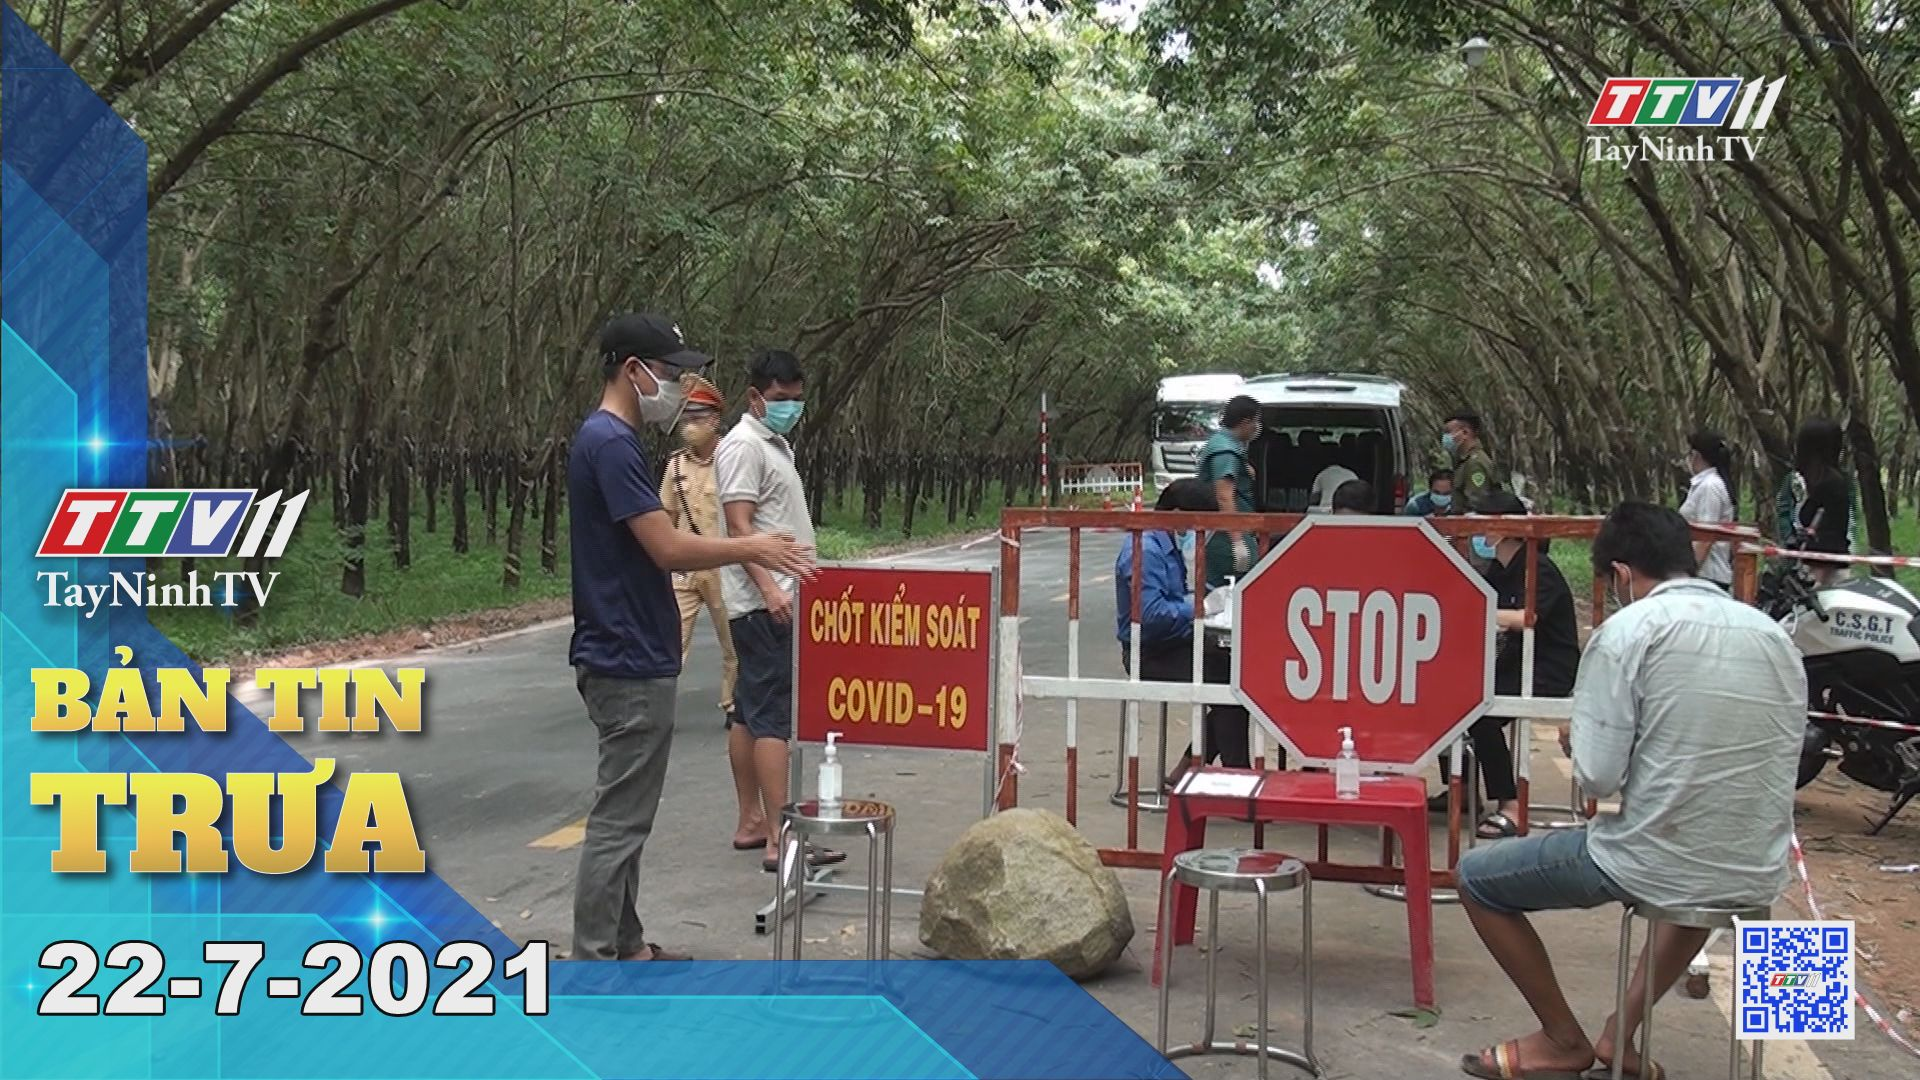 Bản tin trưa 22-7-2021 | Tin tức hôm nay | TayNinhTV